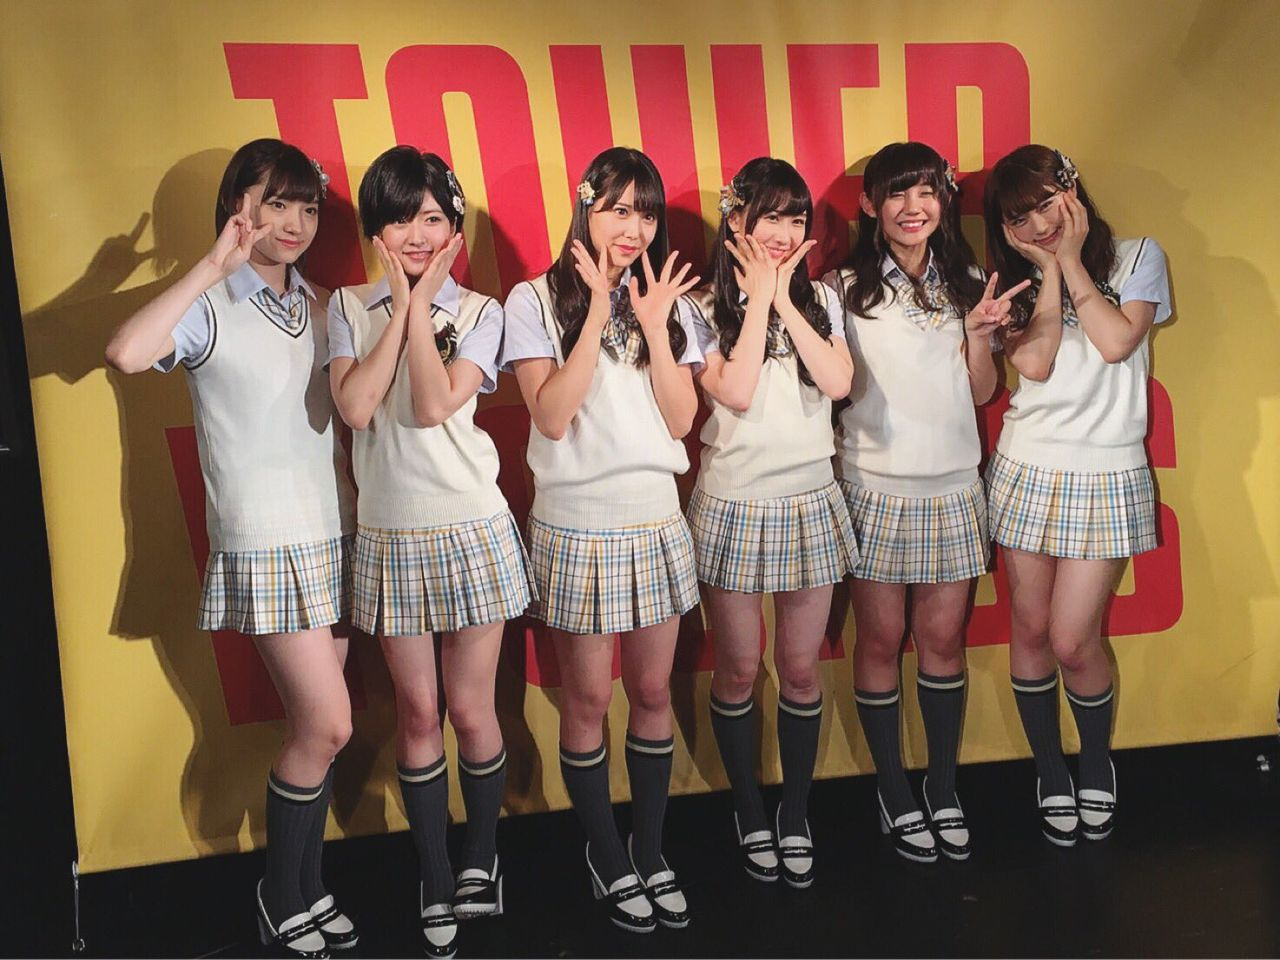 【NMB48渋谷タワレコイベント】NMBセンター争い中の6人が揃い踏み!